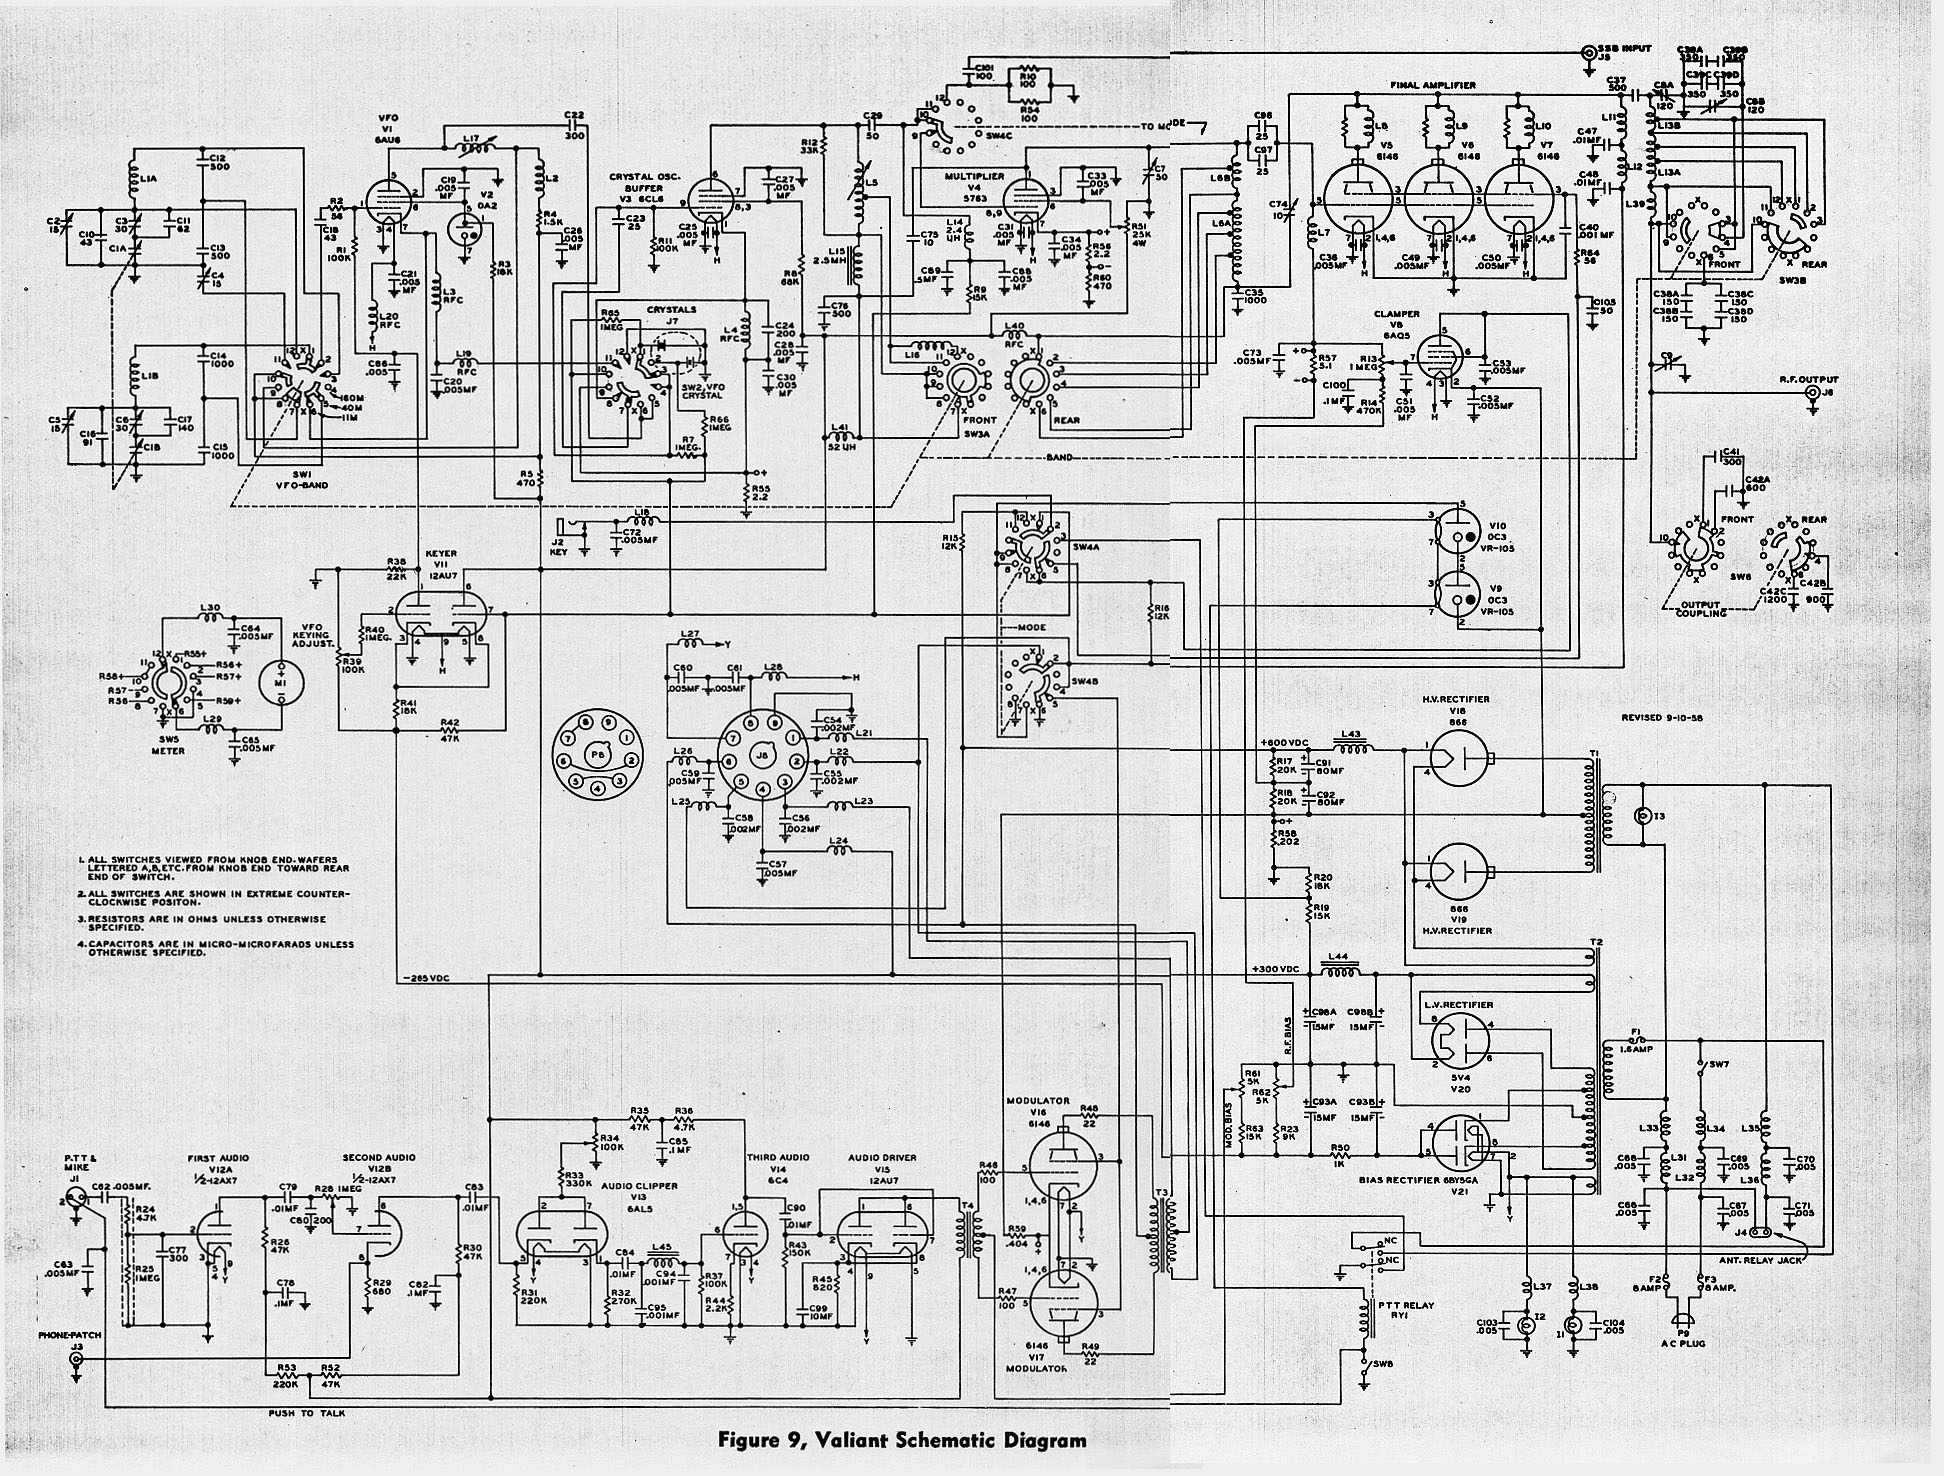 hight resolution of 1955 1962 e f johnson viking valiant am cw transmitter wiegand wiring diagram johnson radio wiring diagram